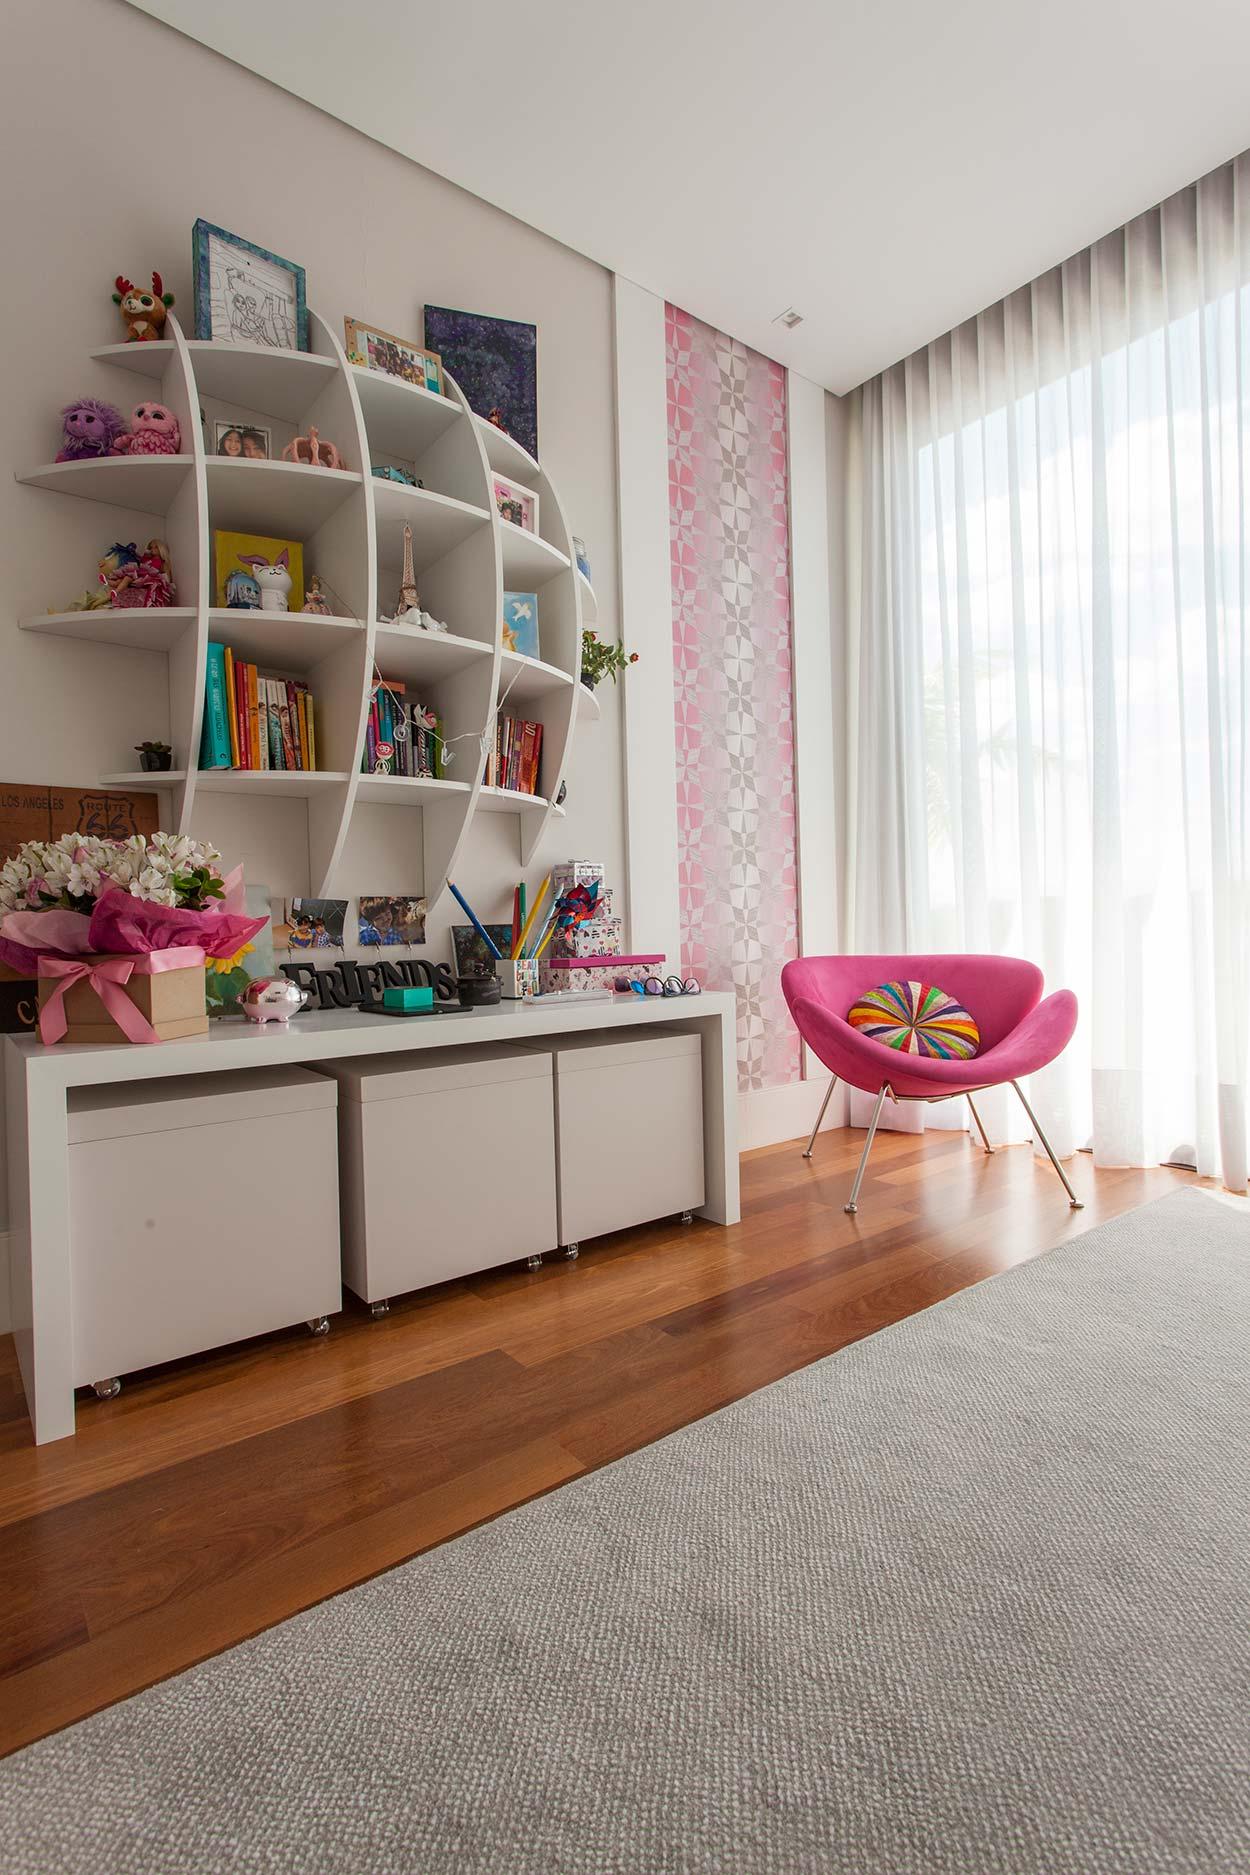 veridianaperes-interiores-Residencia-ER43